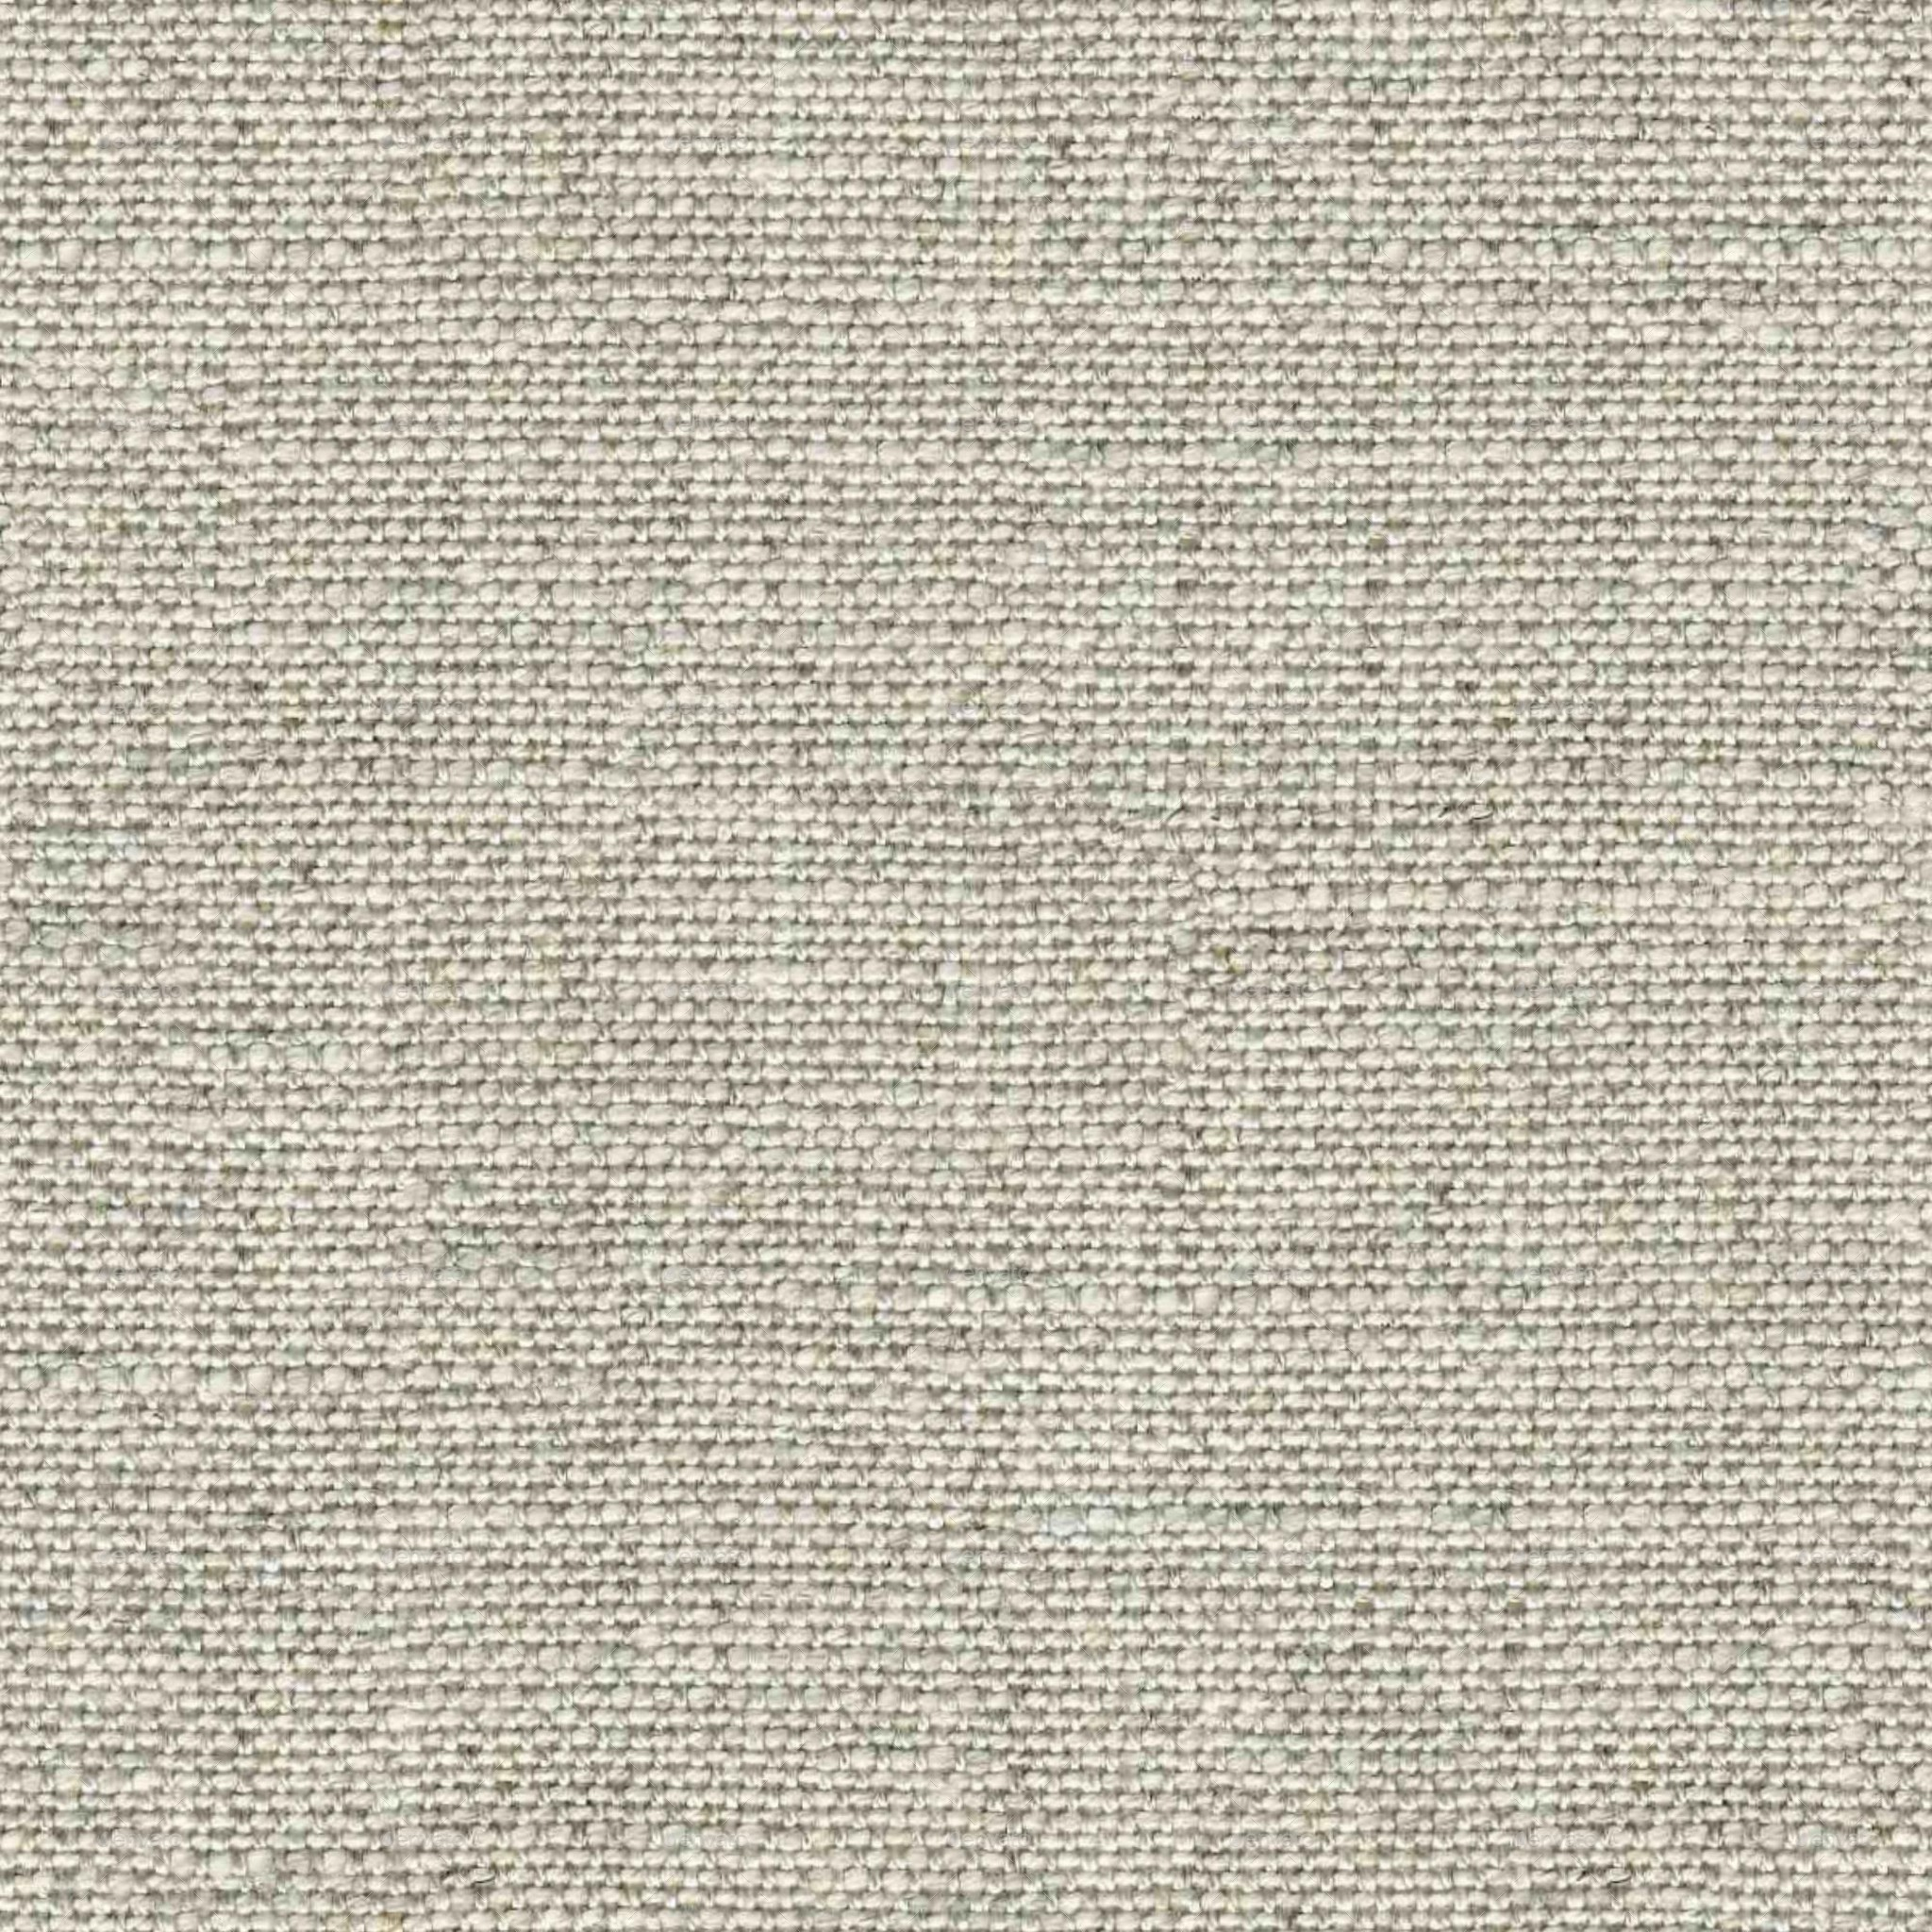 Fabric Seamless Texture Set Volume 2